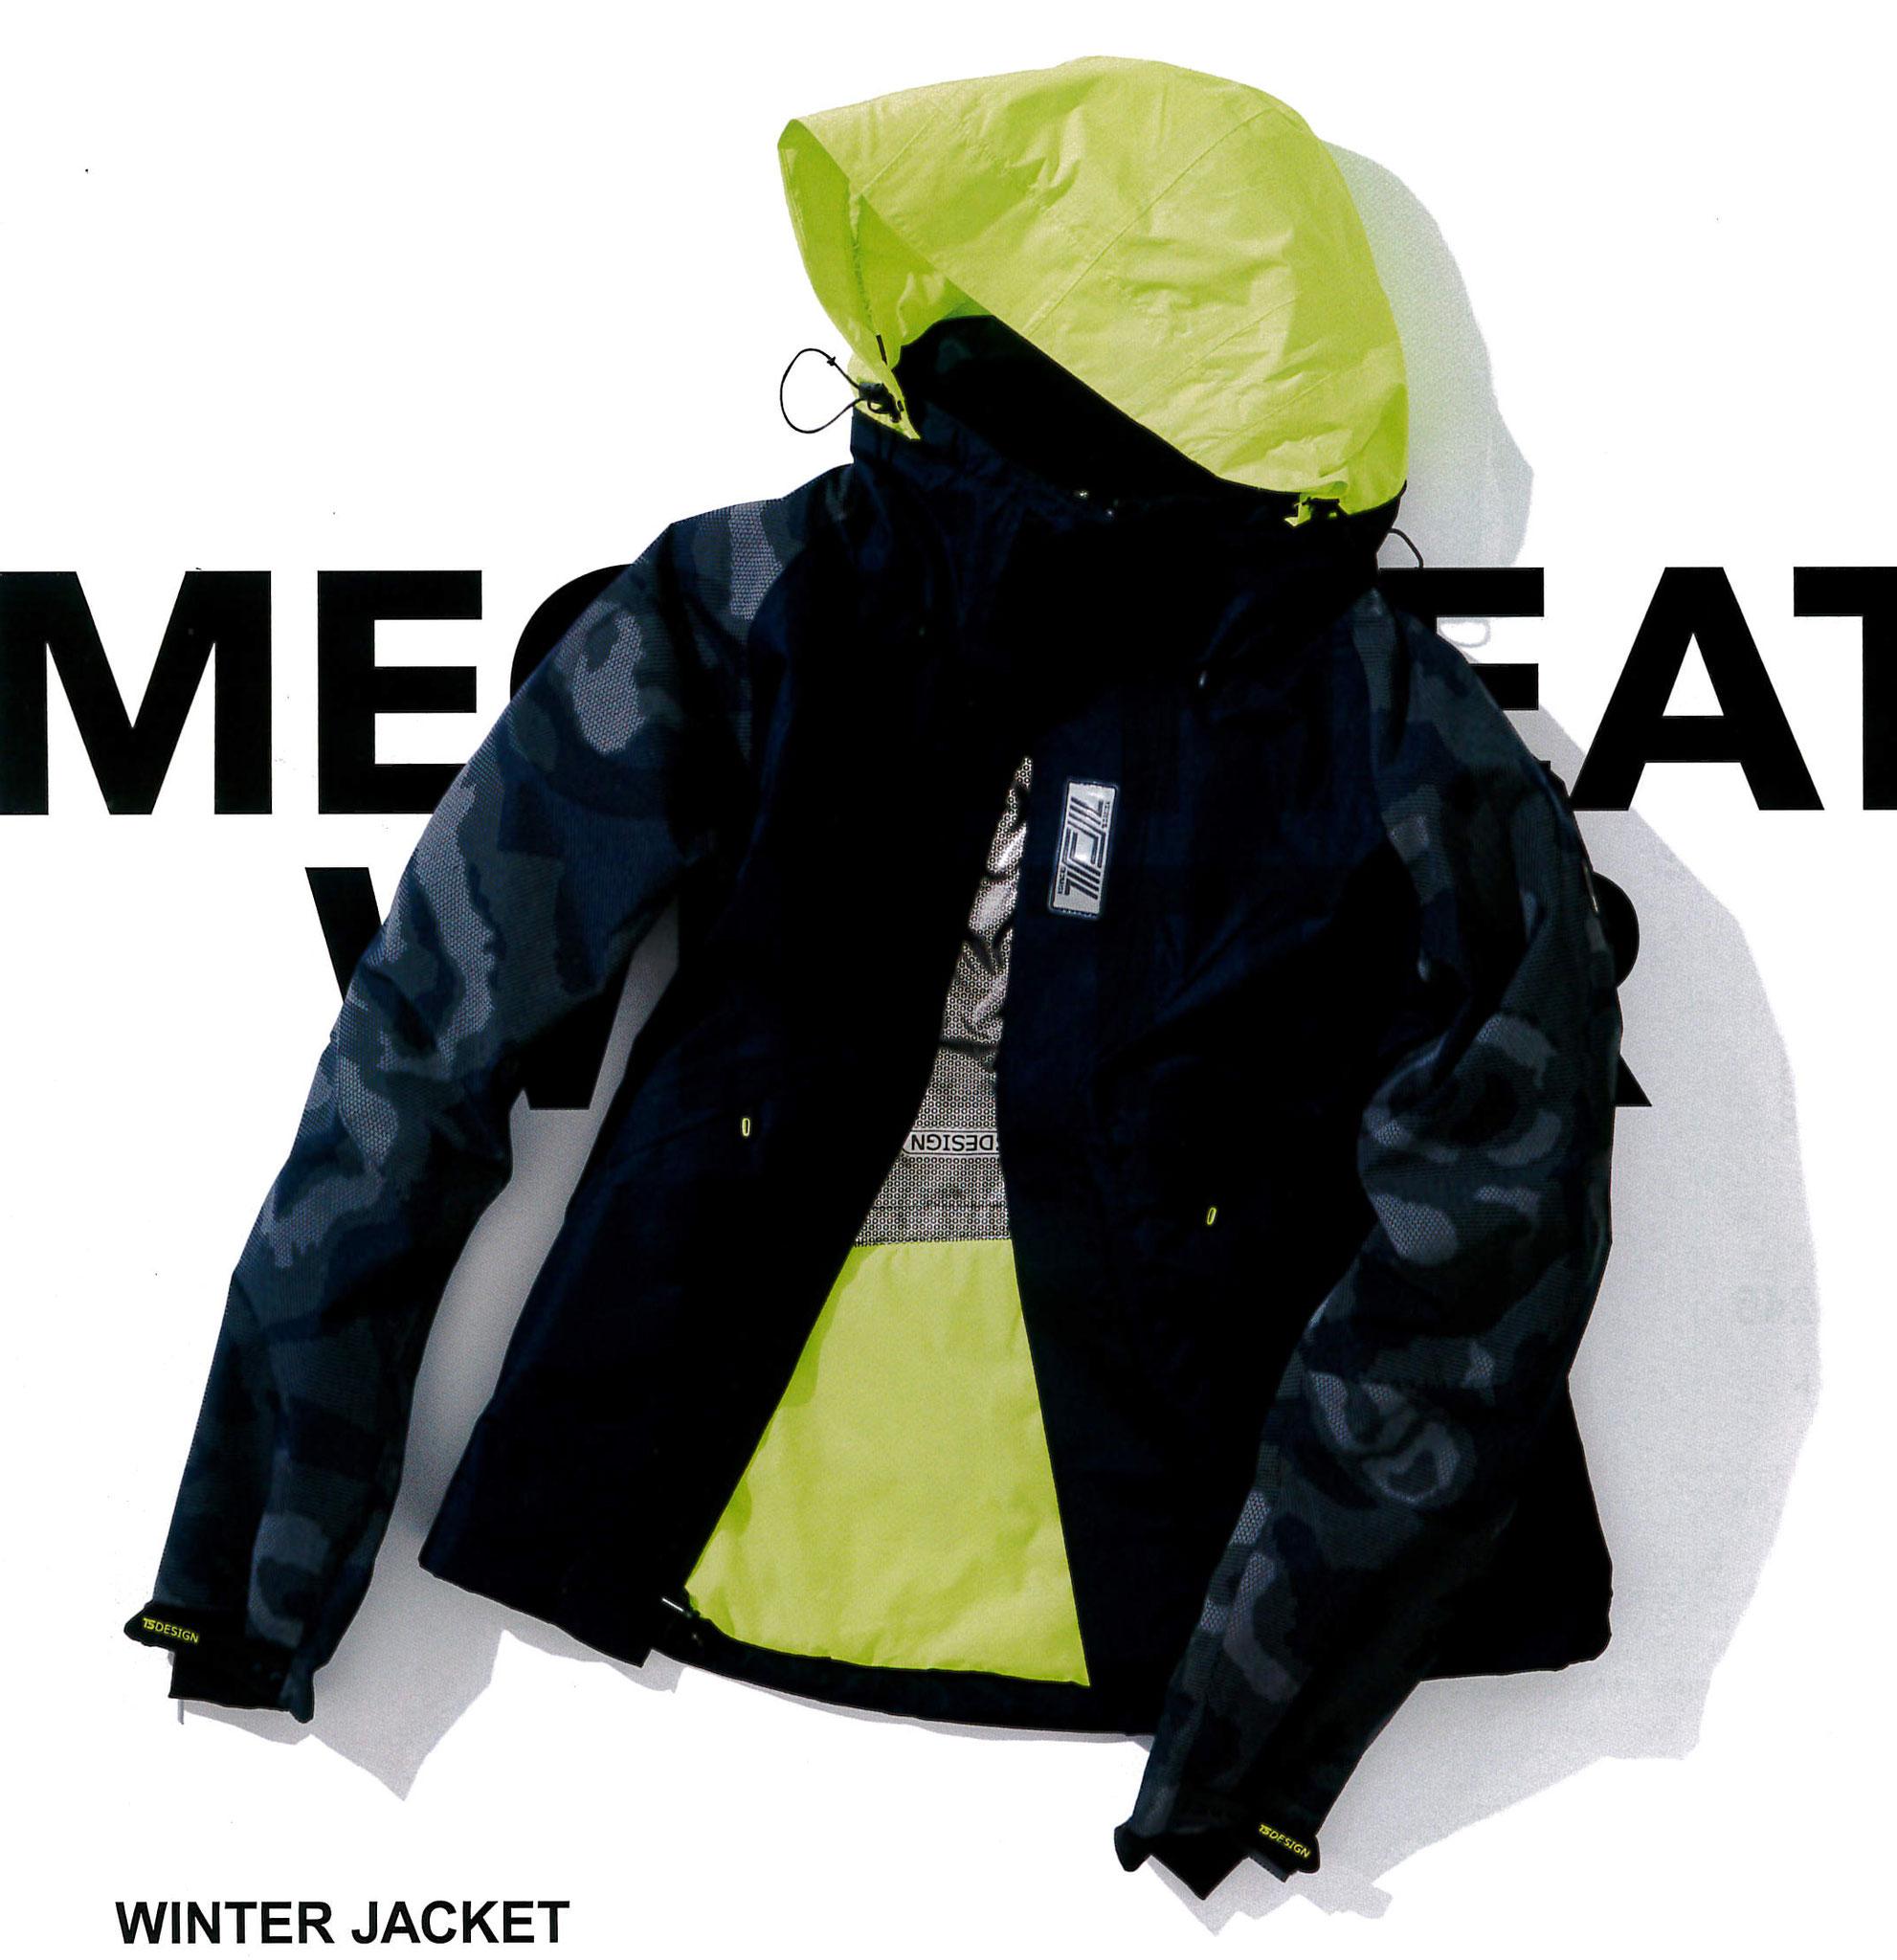 TS DESIGN  18236 メガヒートフラッシュ防水防寒ジャケット ¥14,850(税込)参考価格の53%OFF